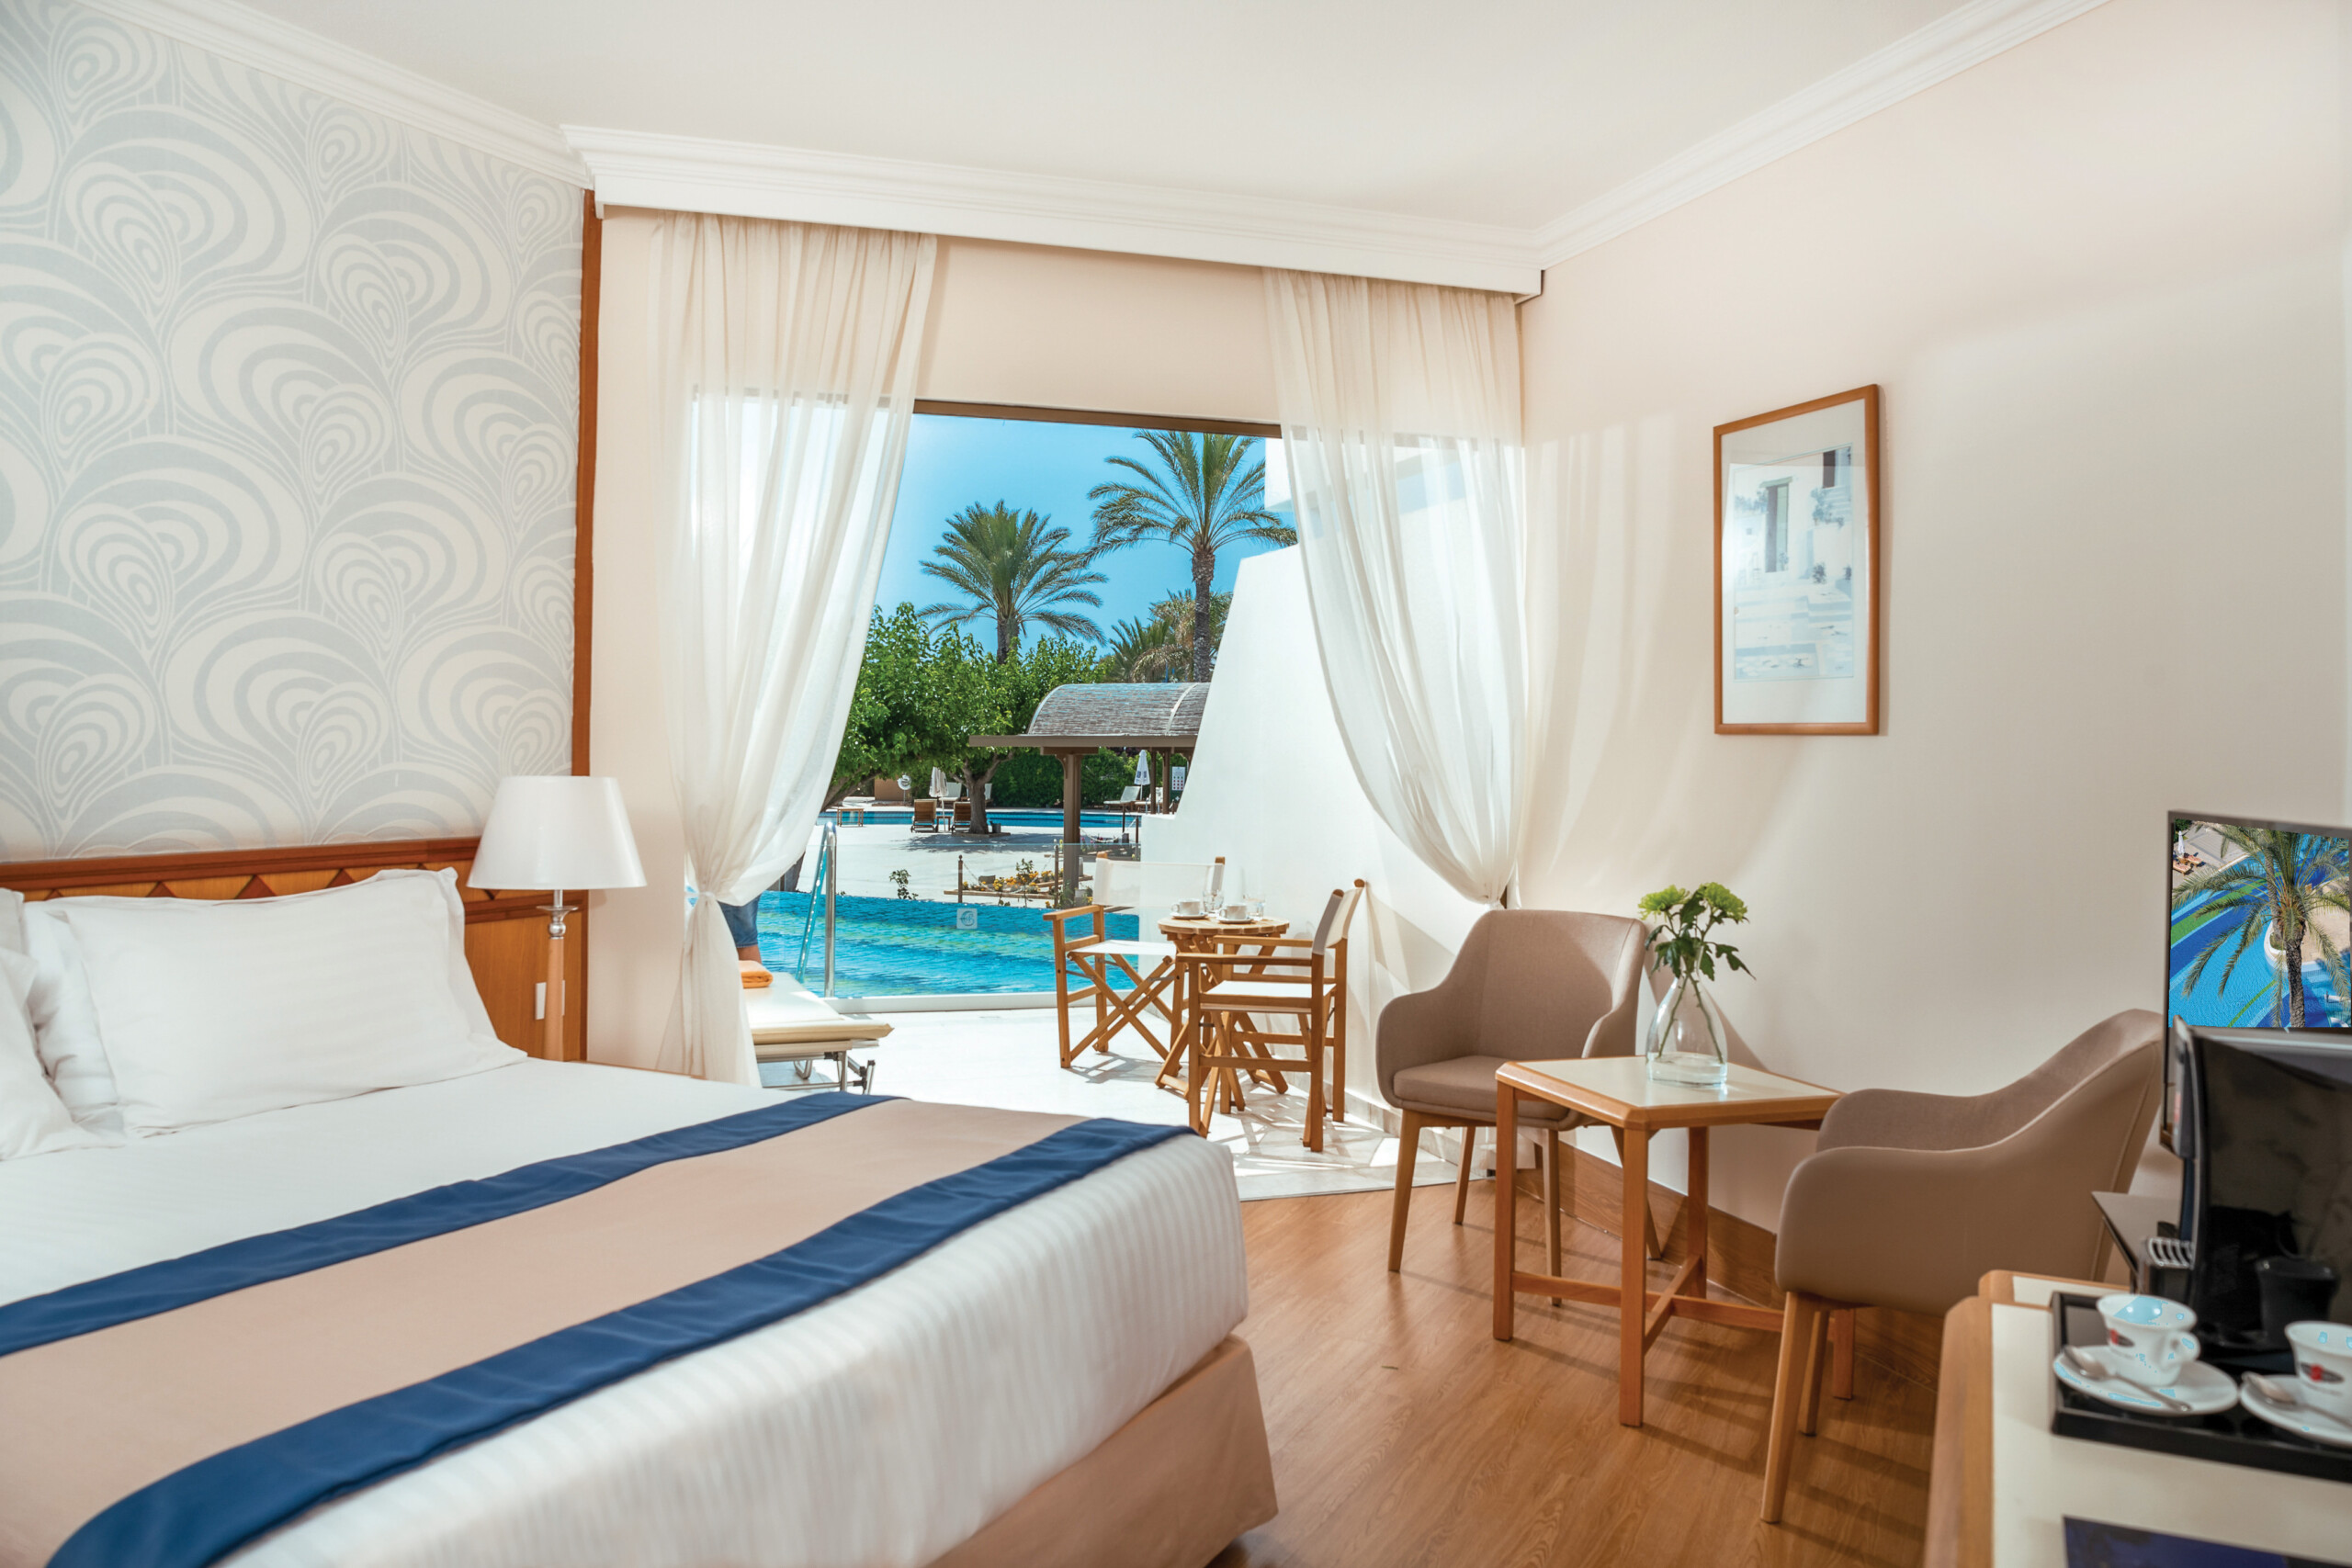 45 ATHENA BEACH HOTEL SUPERIOR SWIM-UP ROOM